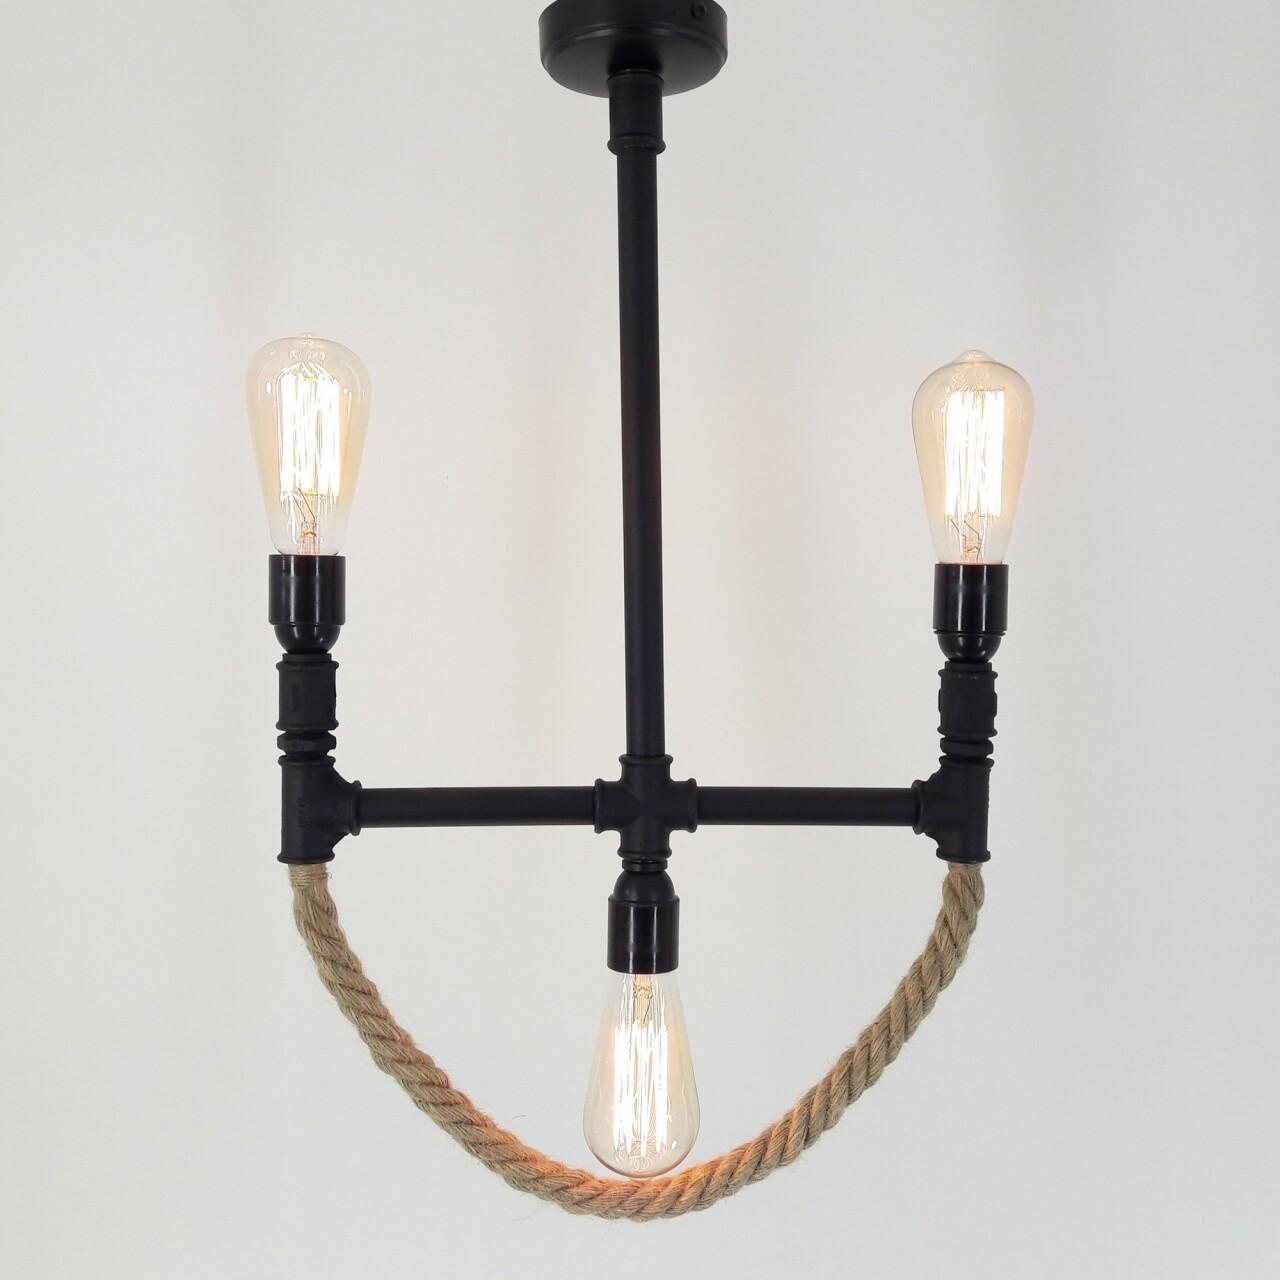 Candelabru All Design, metal, 55x40x65 cm, Anchor Black